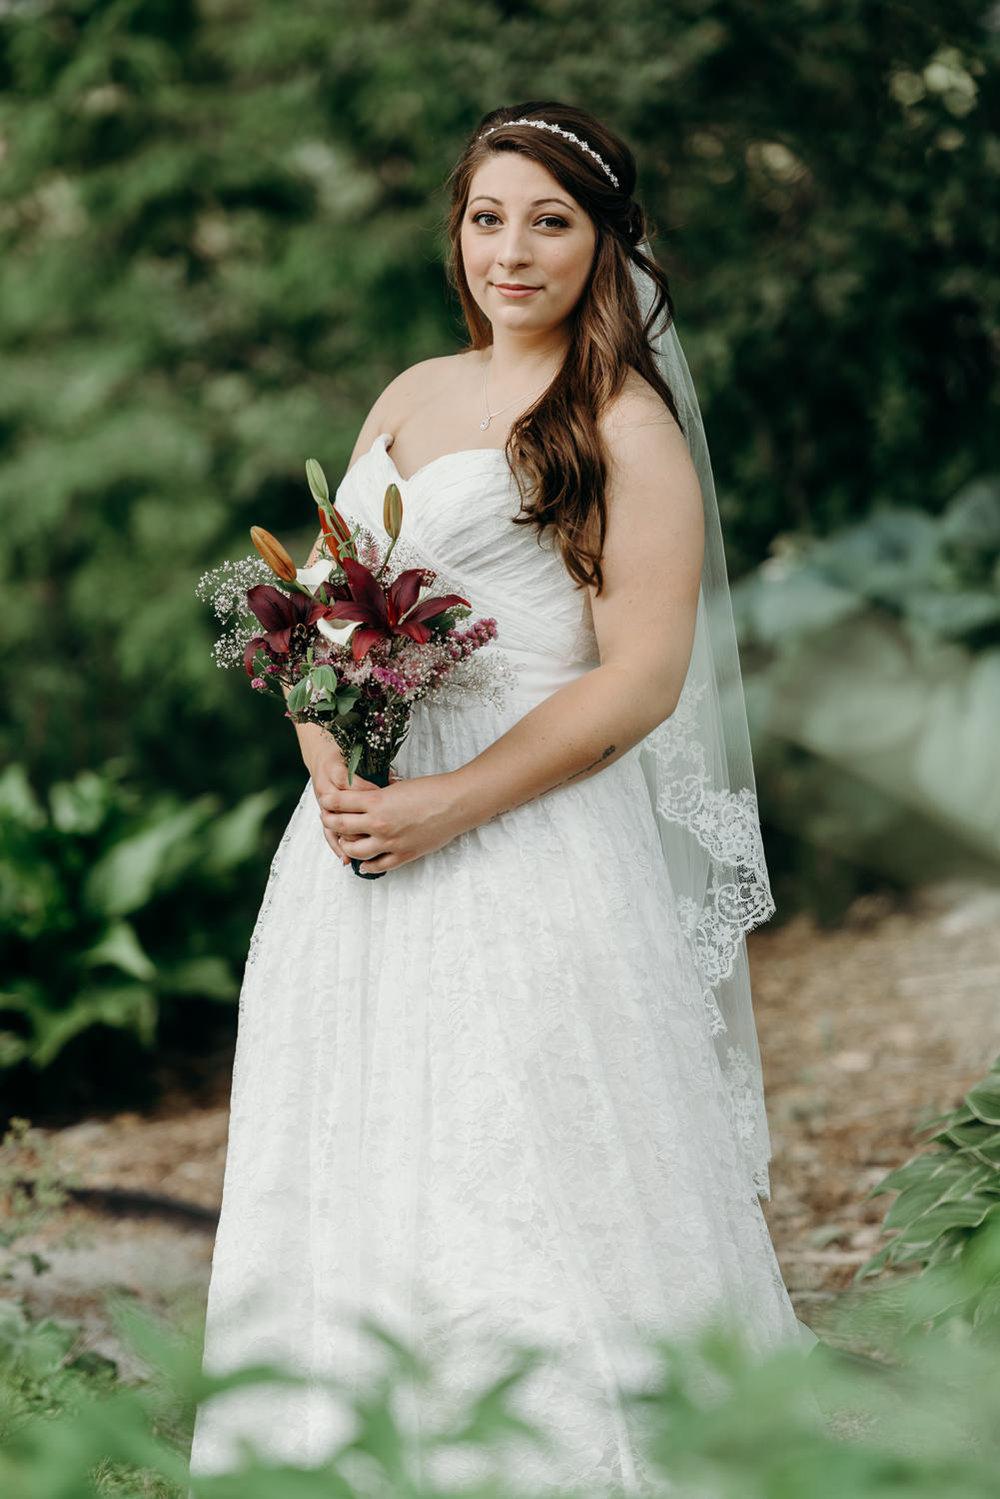 Grant Beachy wedding photographer goshen elkhart south bend chicago-026.jpg